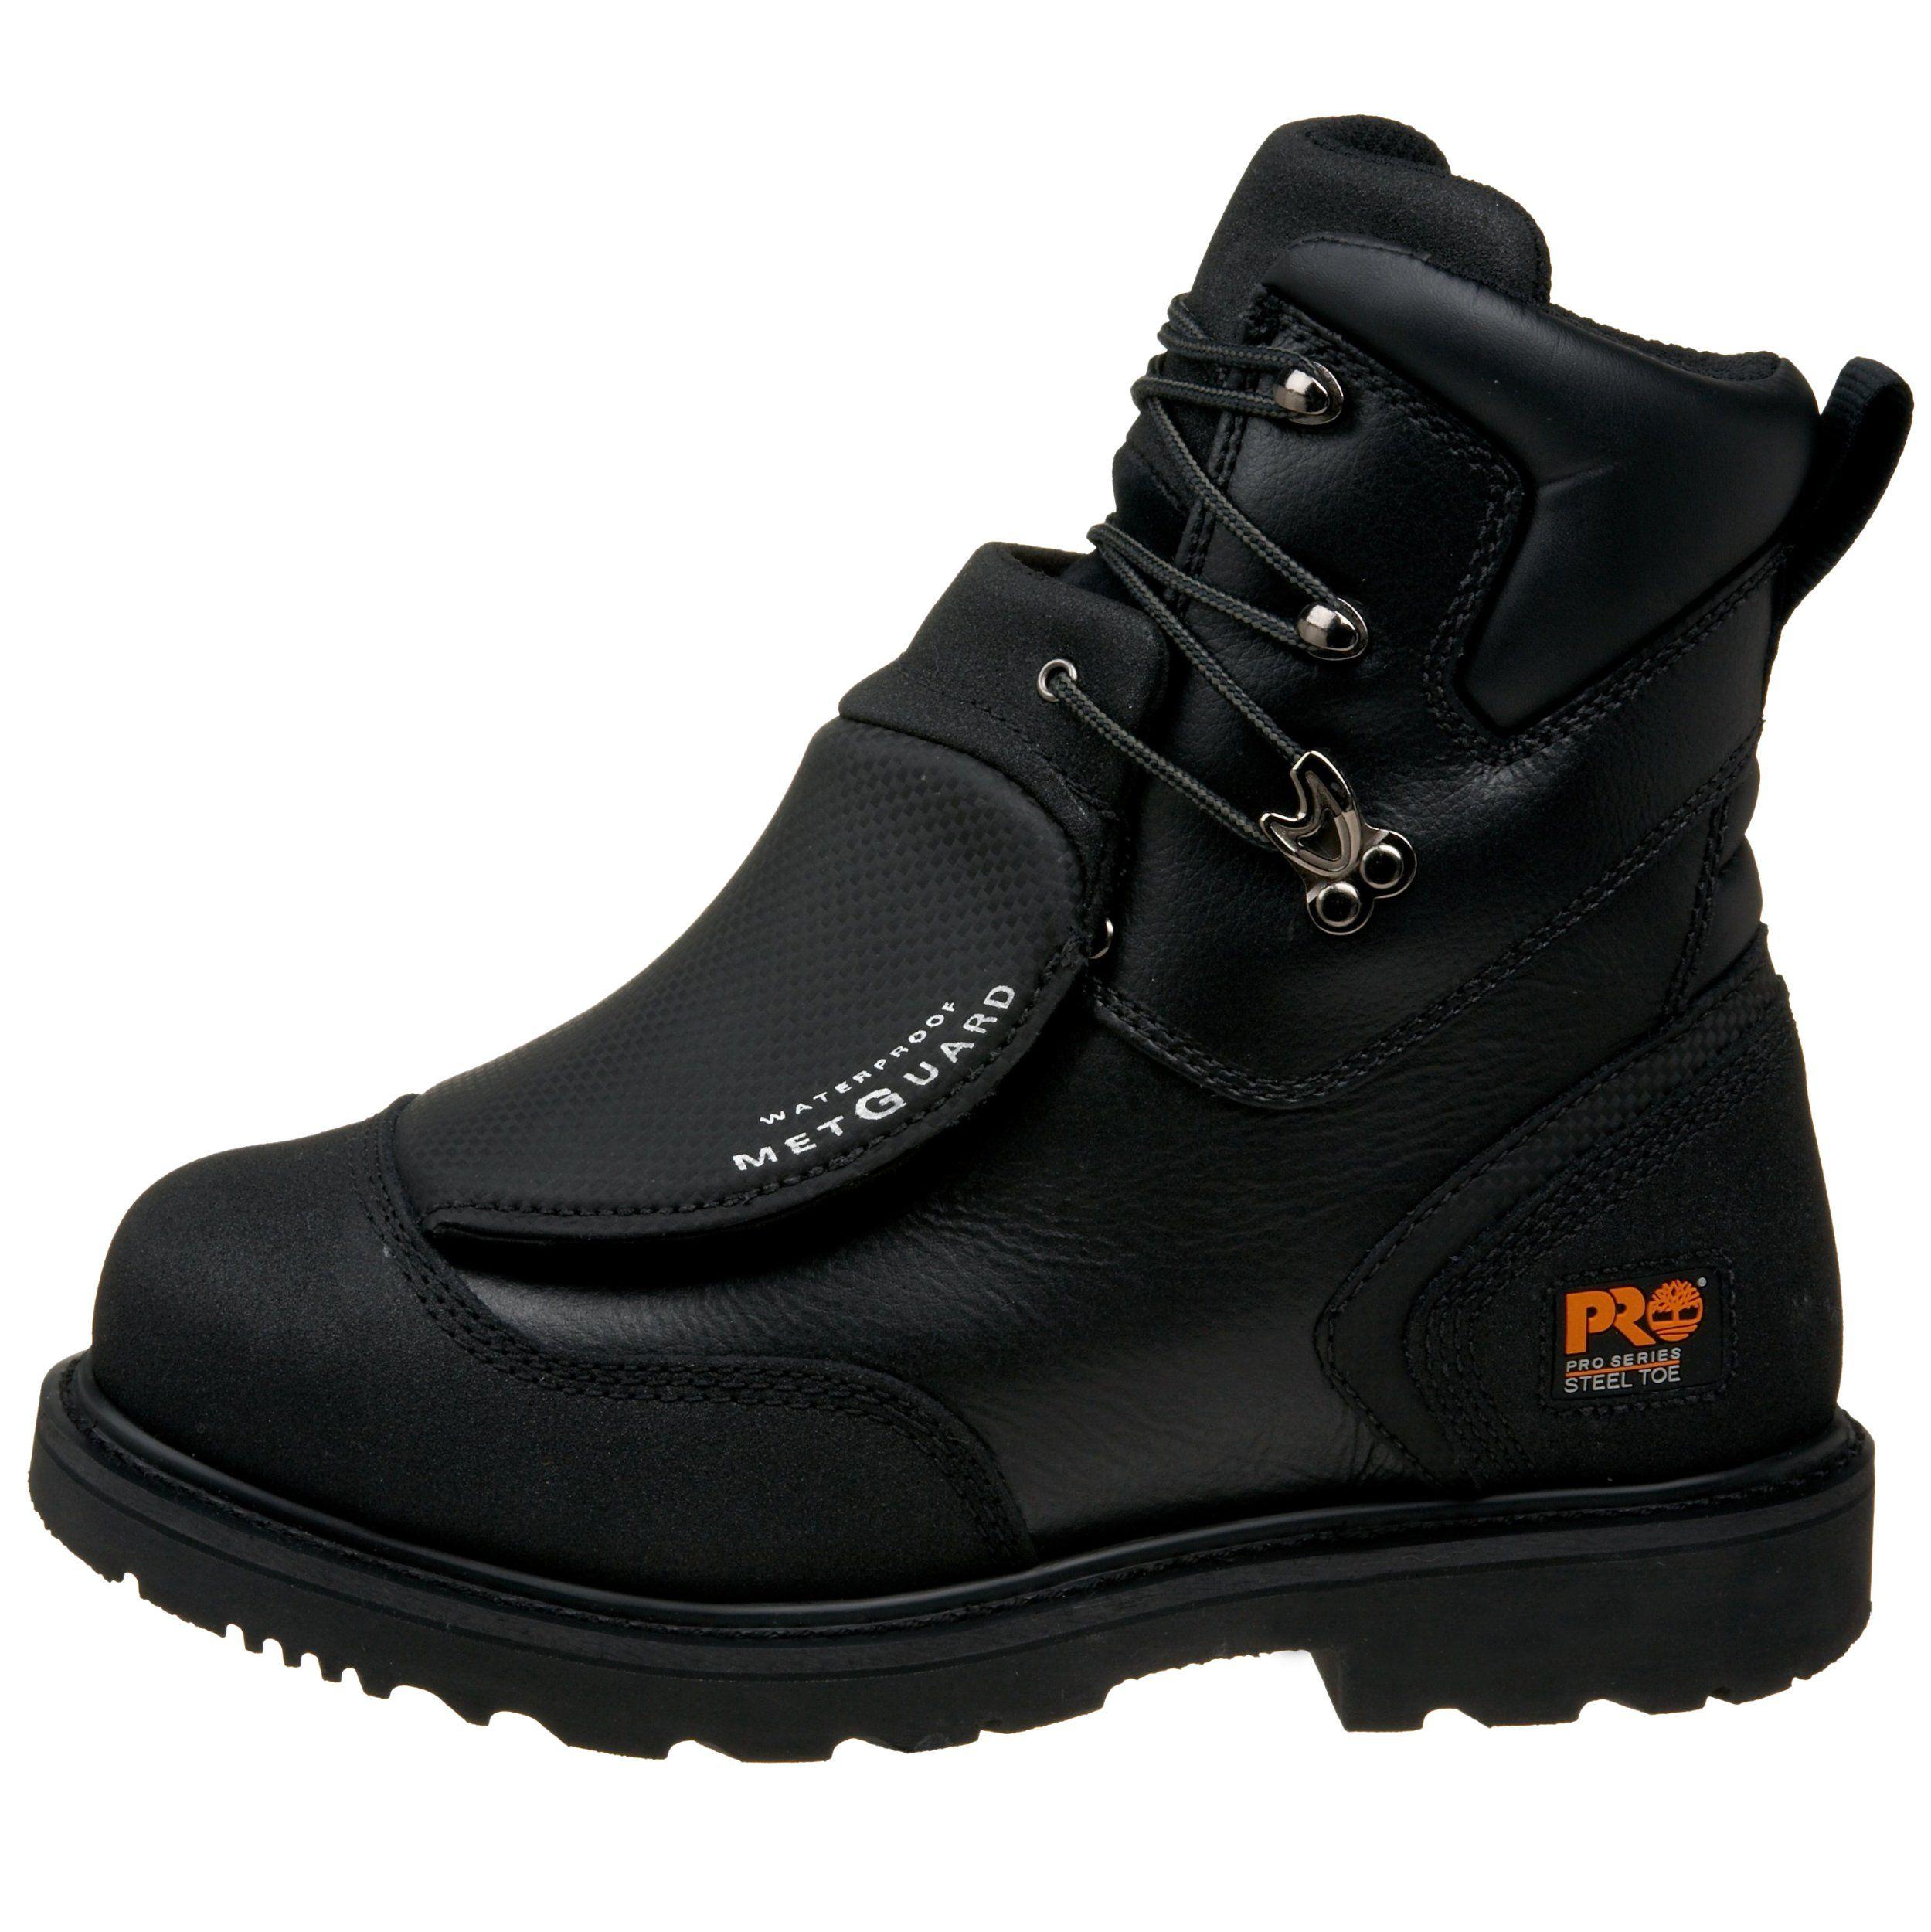 Timberland PRO Men's 53530 8